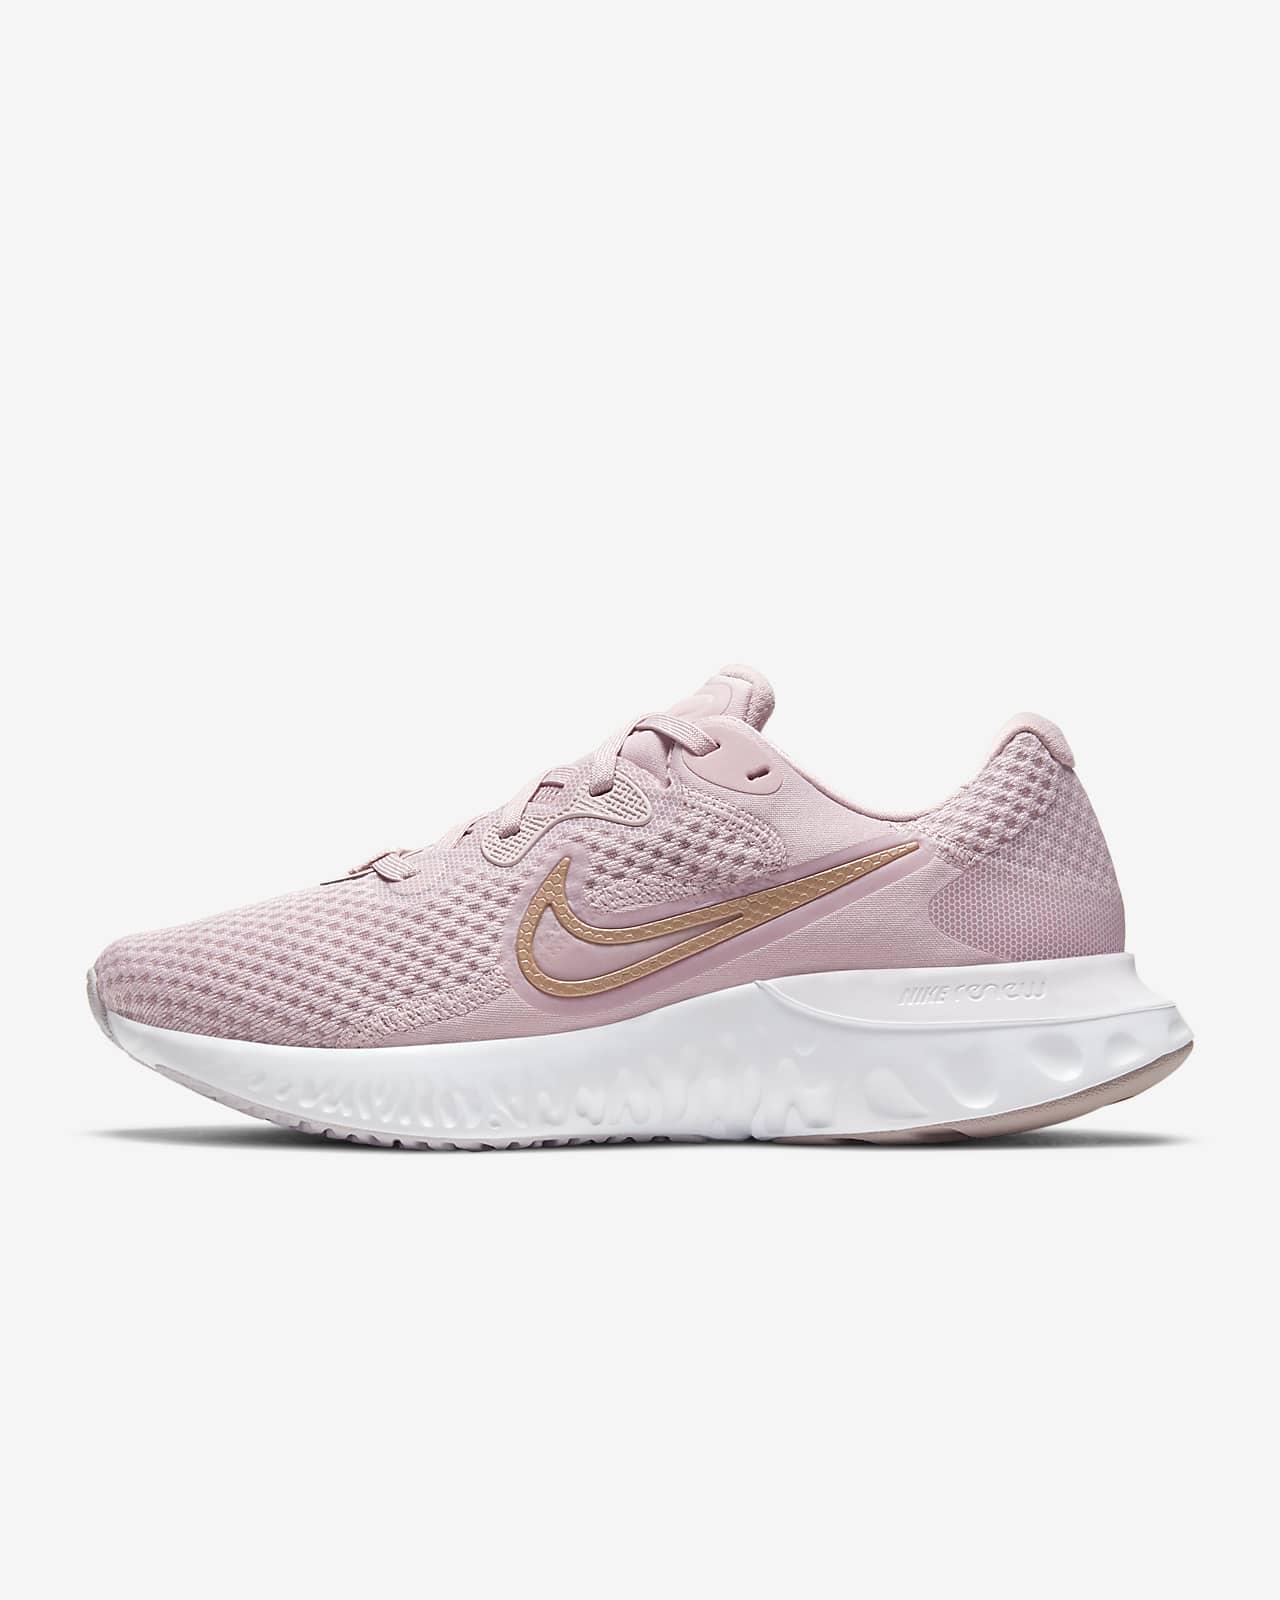 Calzado de running para mujer Nike Renew Run 2